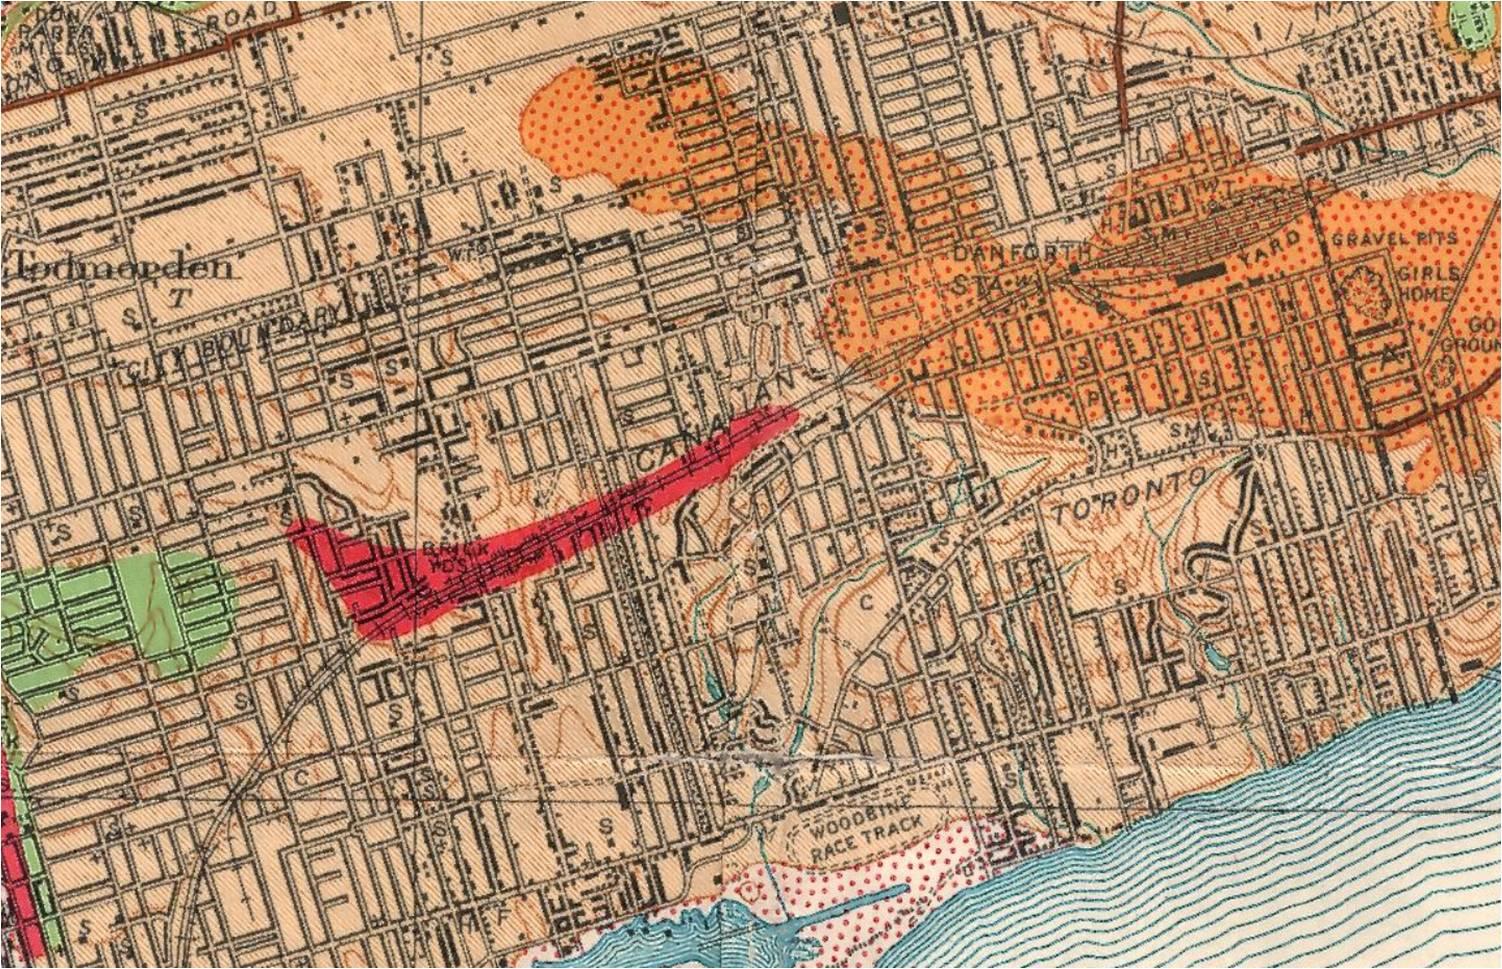 Coleman 1932 map